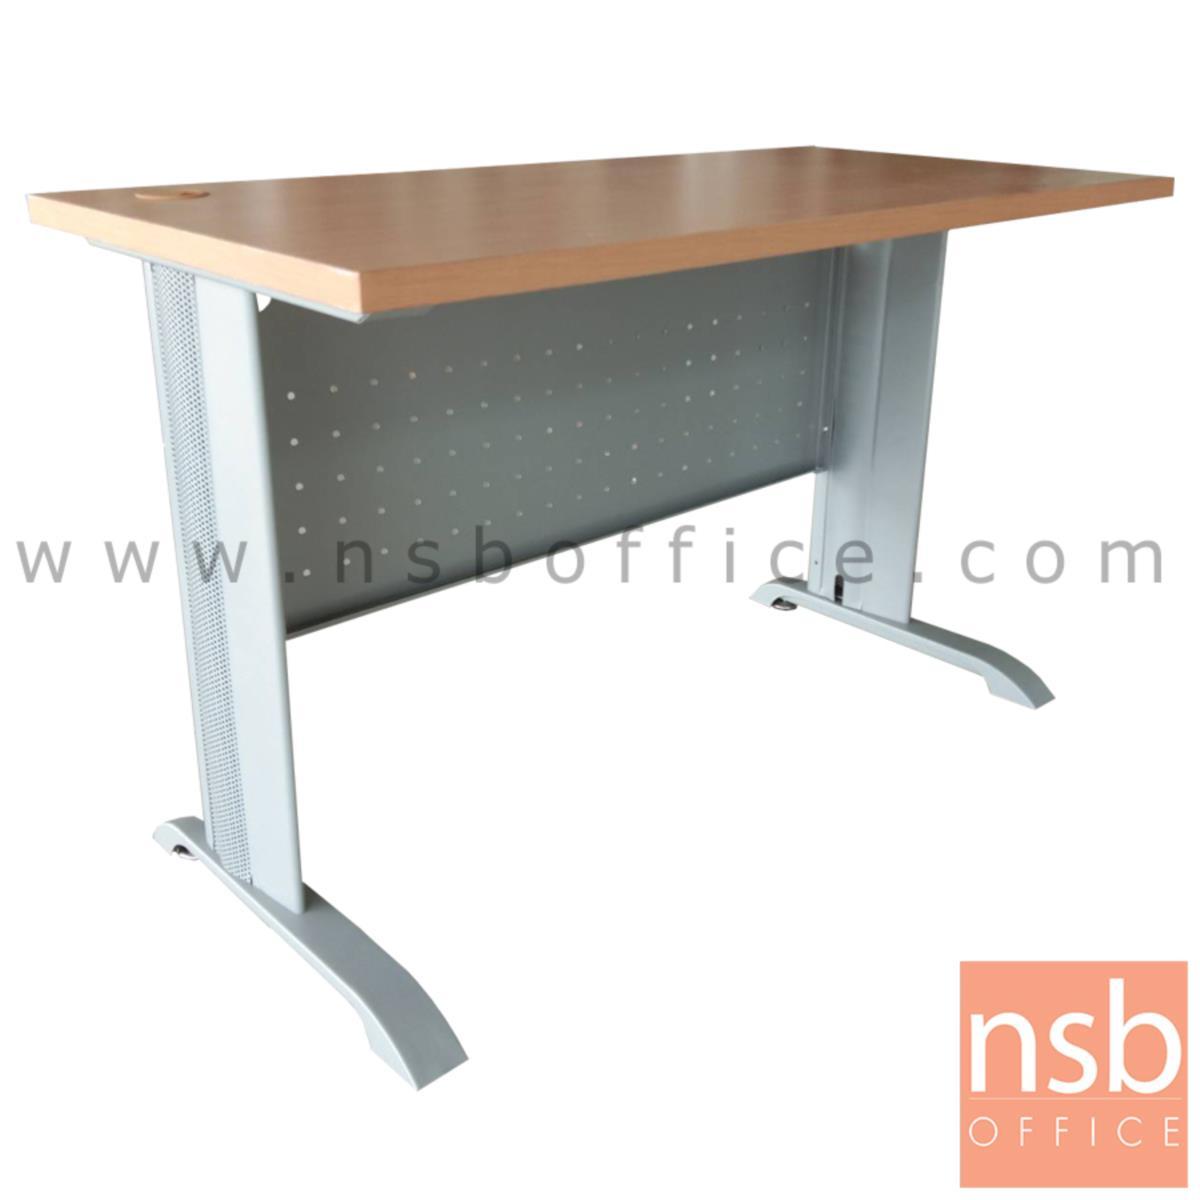 A10A082:โต๊ะโล่ง รุ่น Ultimate (อัลทิเมต) ขนาด 120W ,150W cm.  พร้อมบังโป๊เหล็ก ขาเหล็กสีเทา